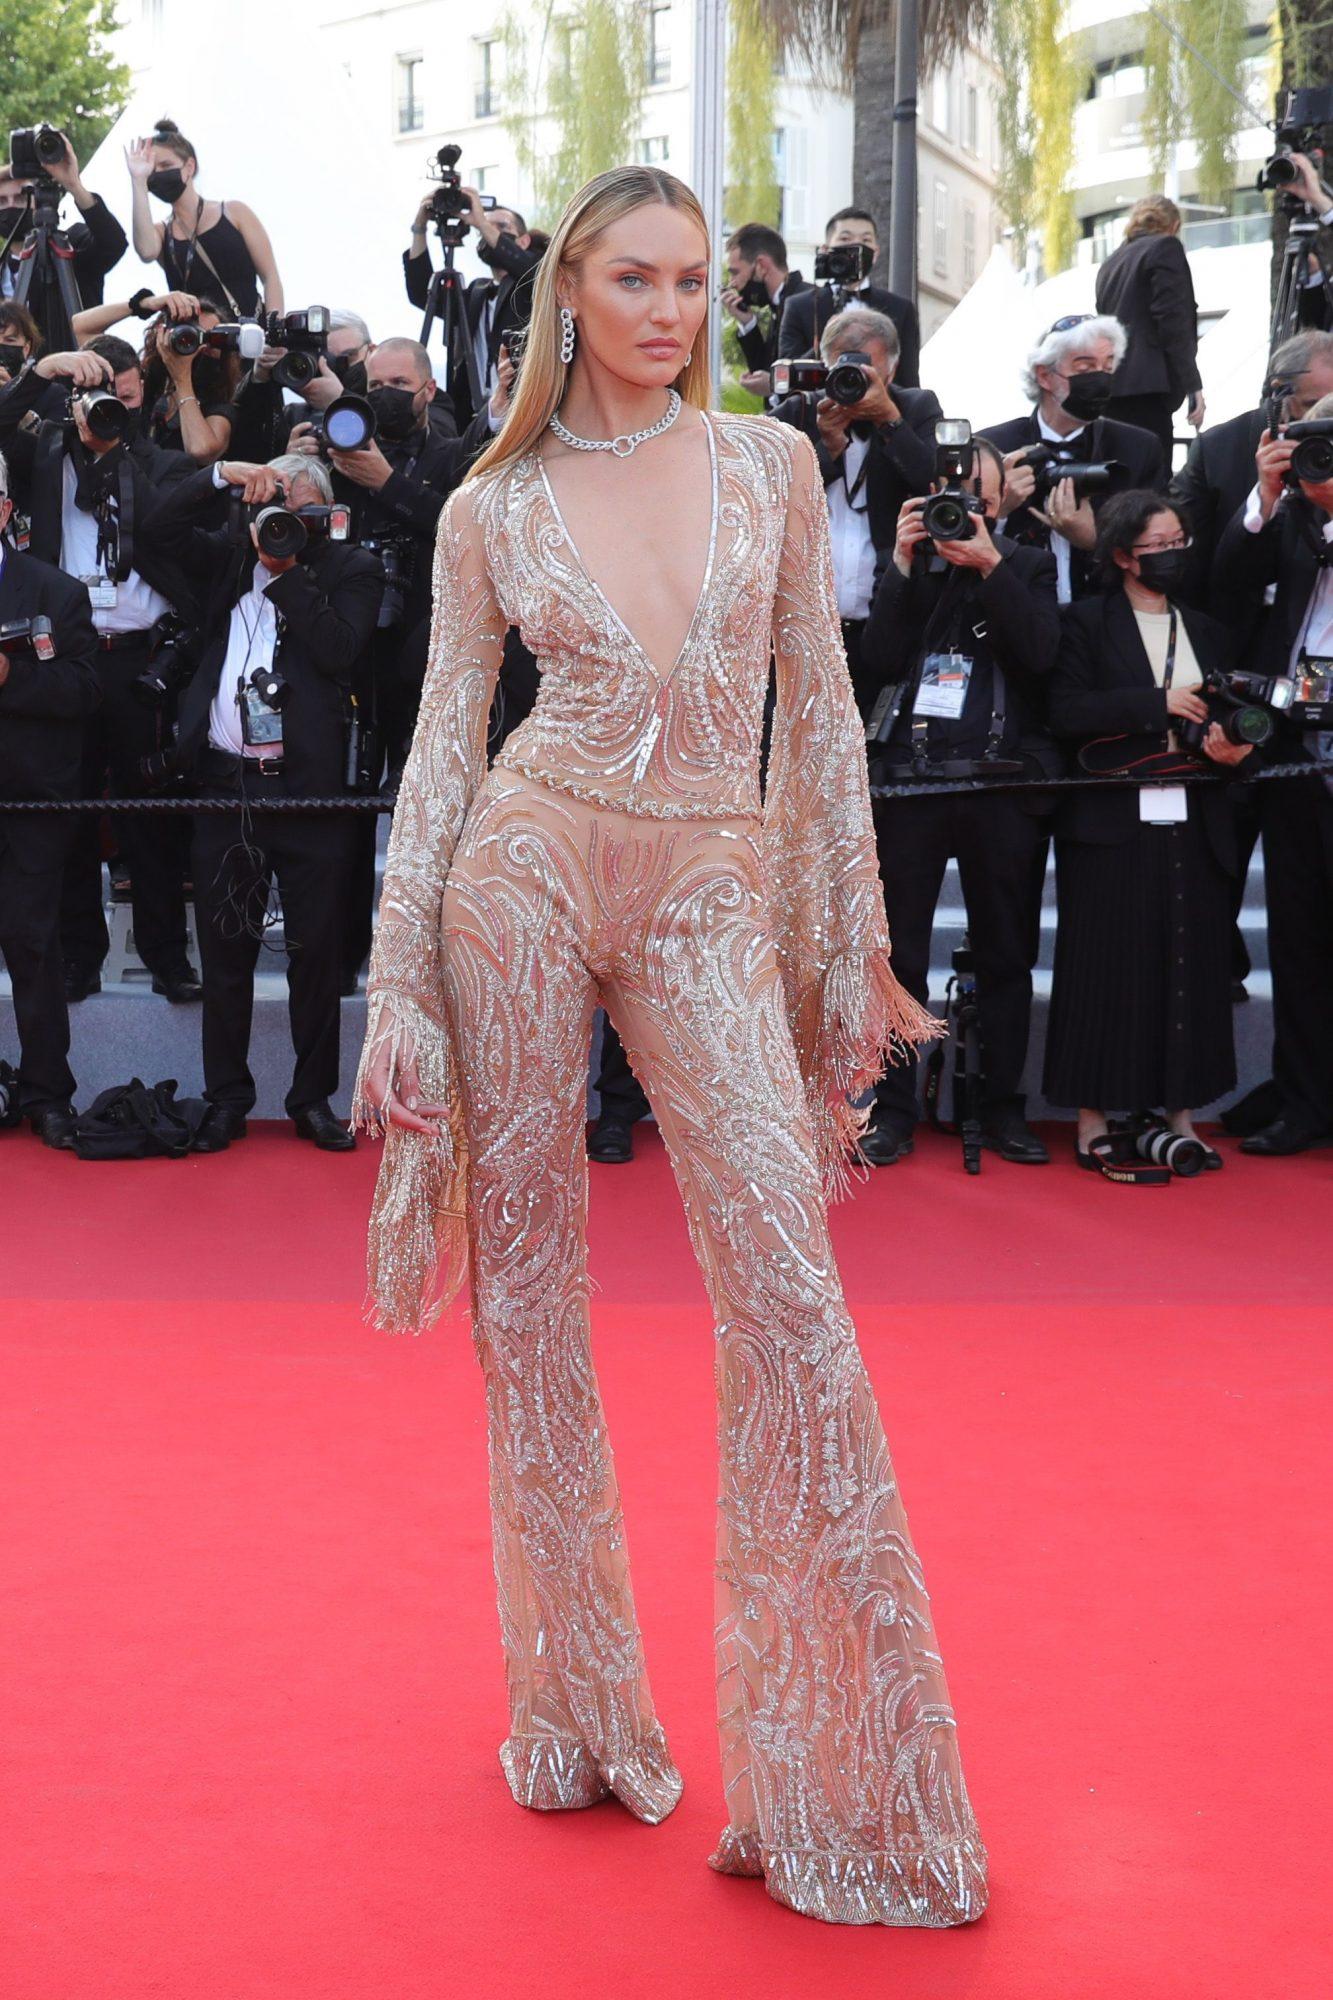 Festival de cine de Cannes alfombra roja, Candice Swanepoel